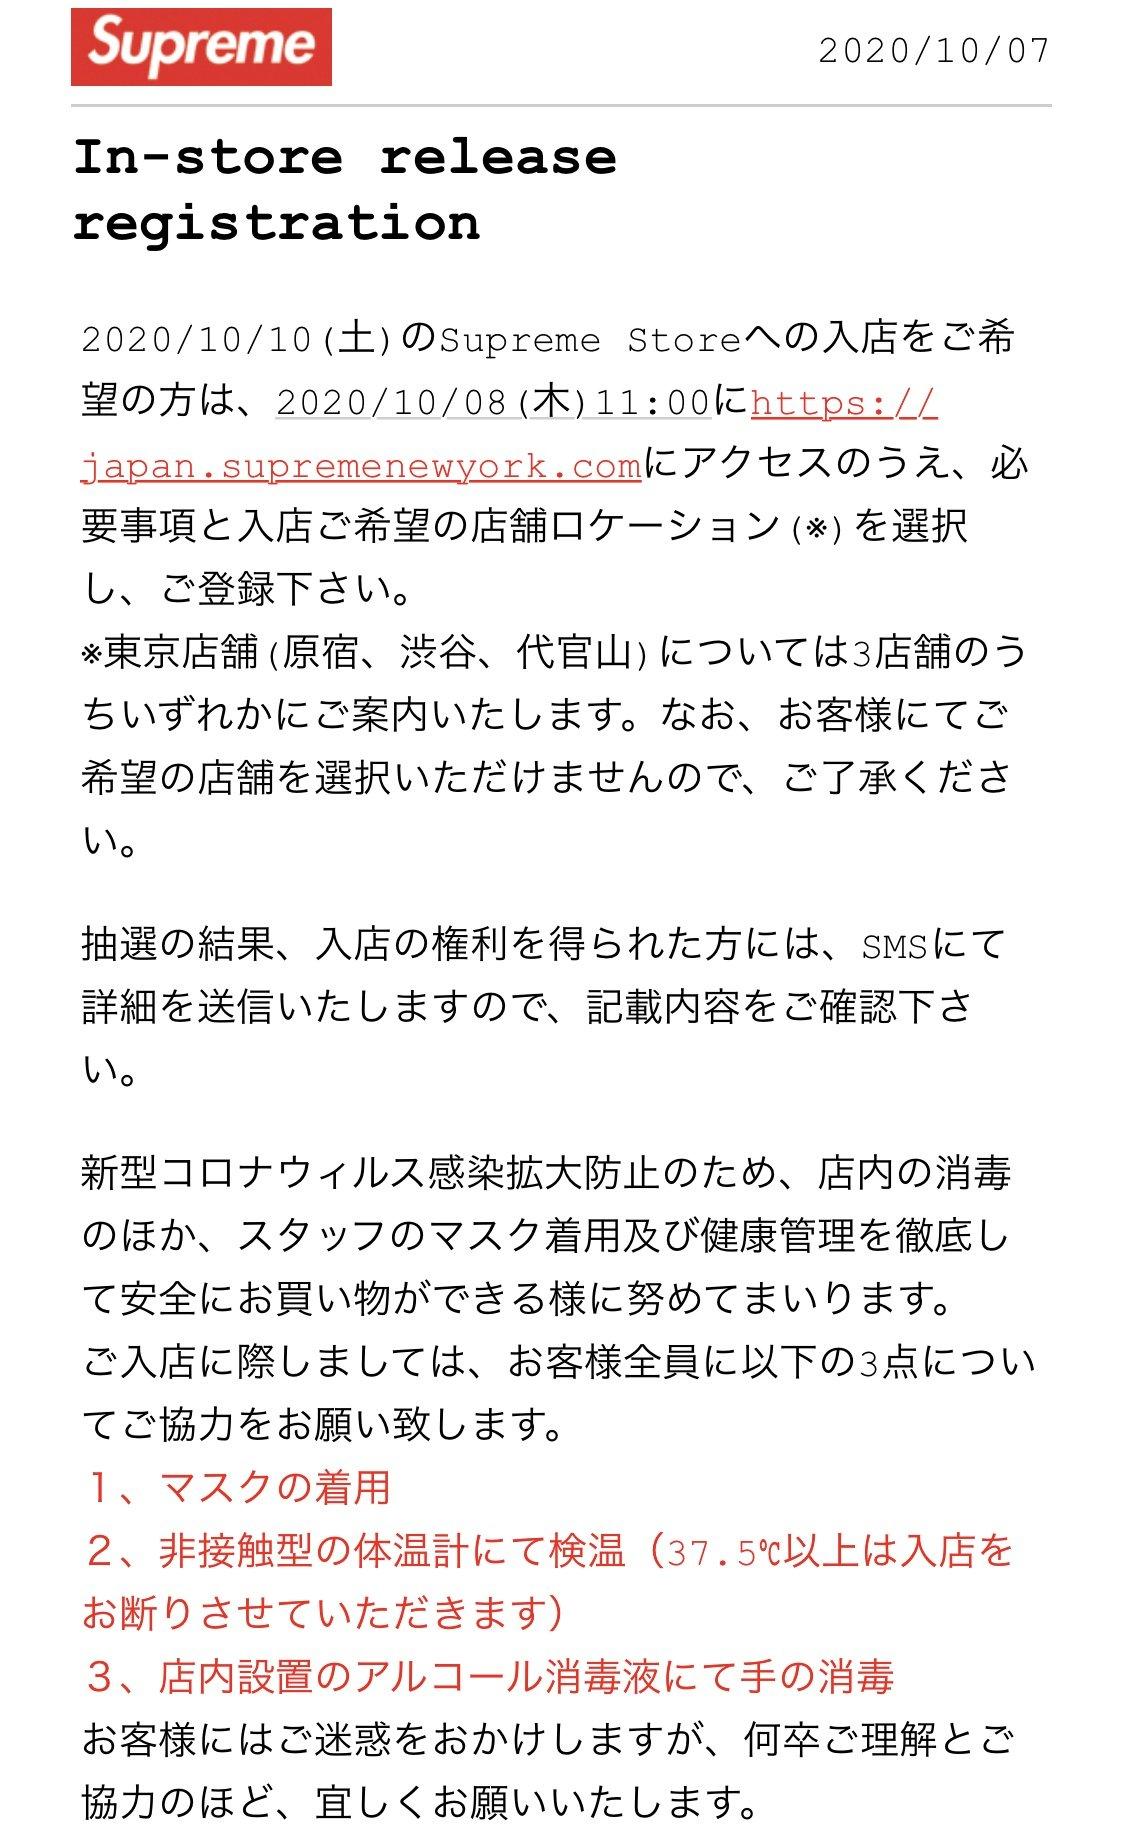 Supreme 2020fw week 7 item lists fall tee シュプリーム 2020年 秋冬 ウィーク7 最新 新作 販売